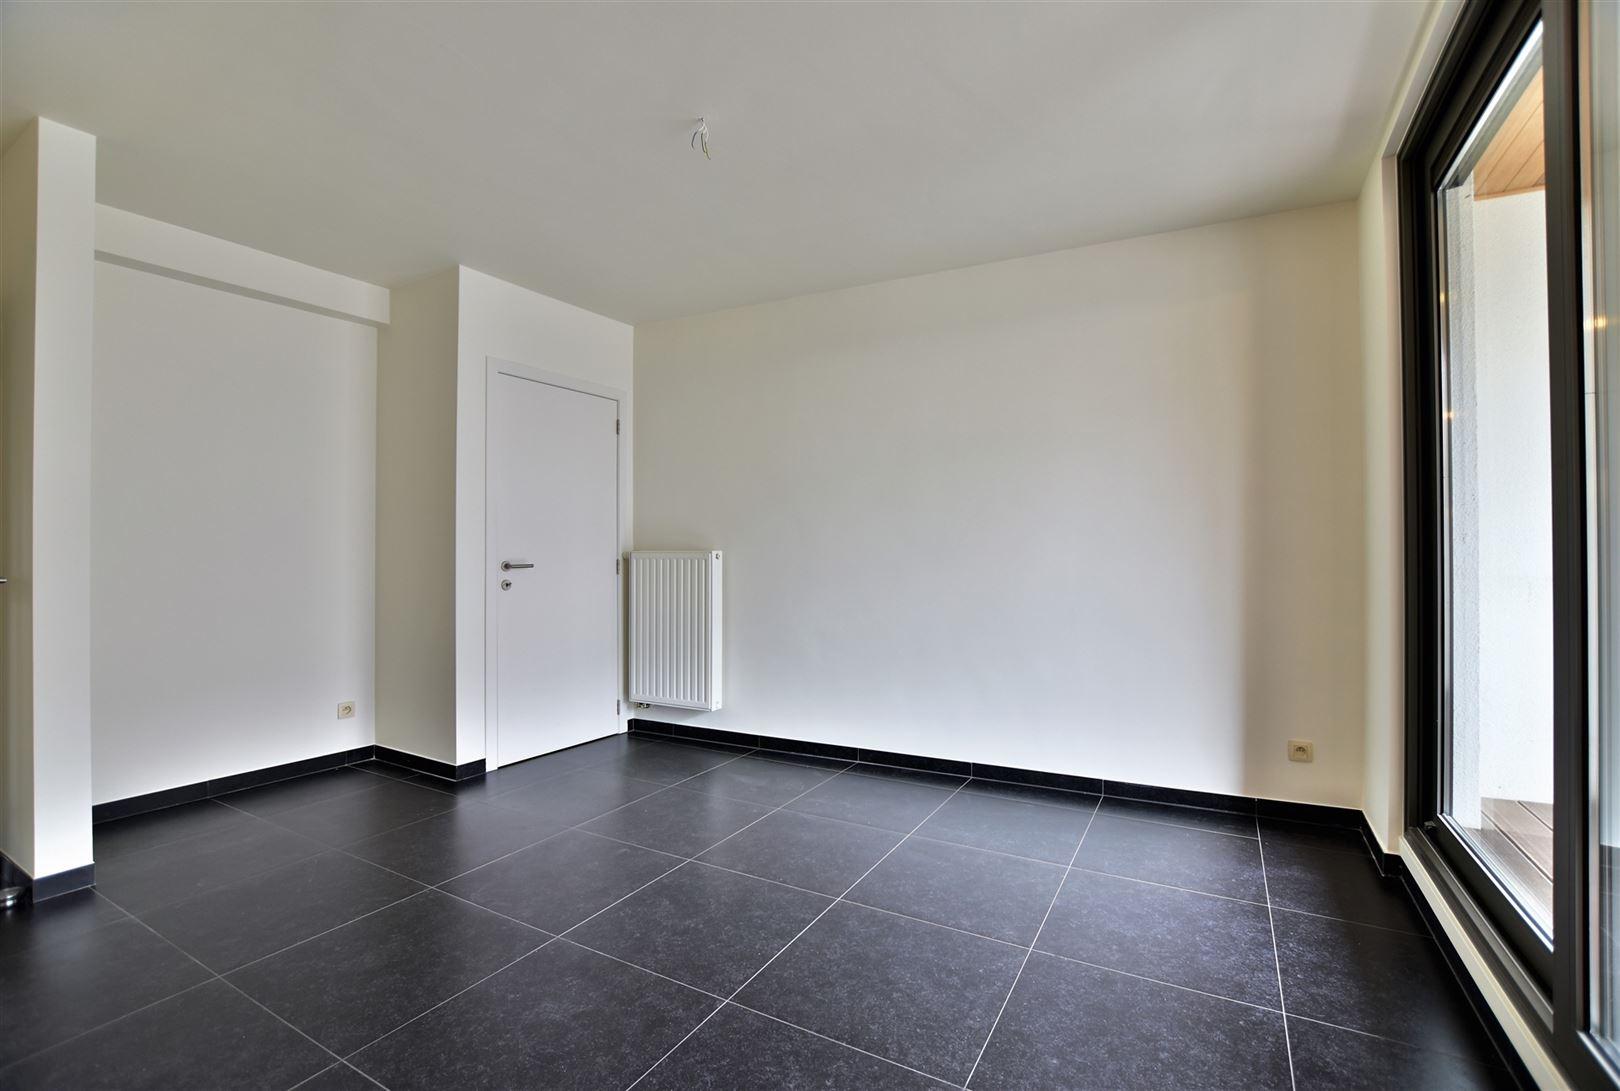 Foto 9 : Duplex/Penthouse te 9200 Sint-Gillis-bij-Dendermonde (België) - Prijs € 278.000